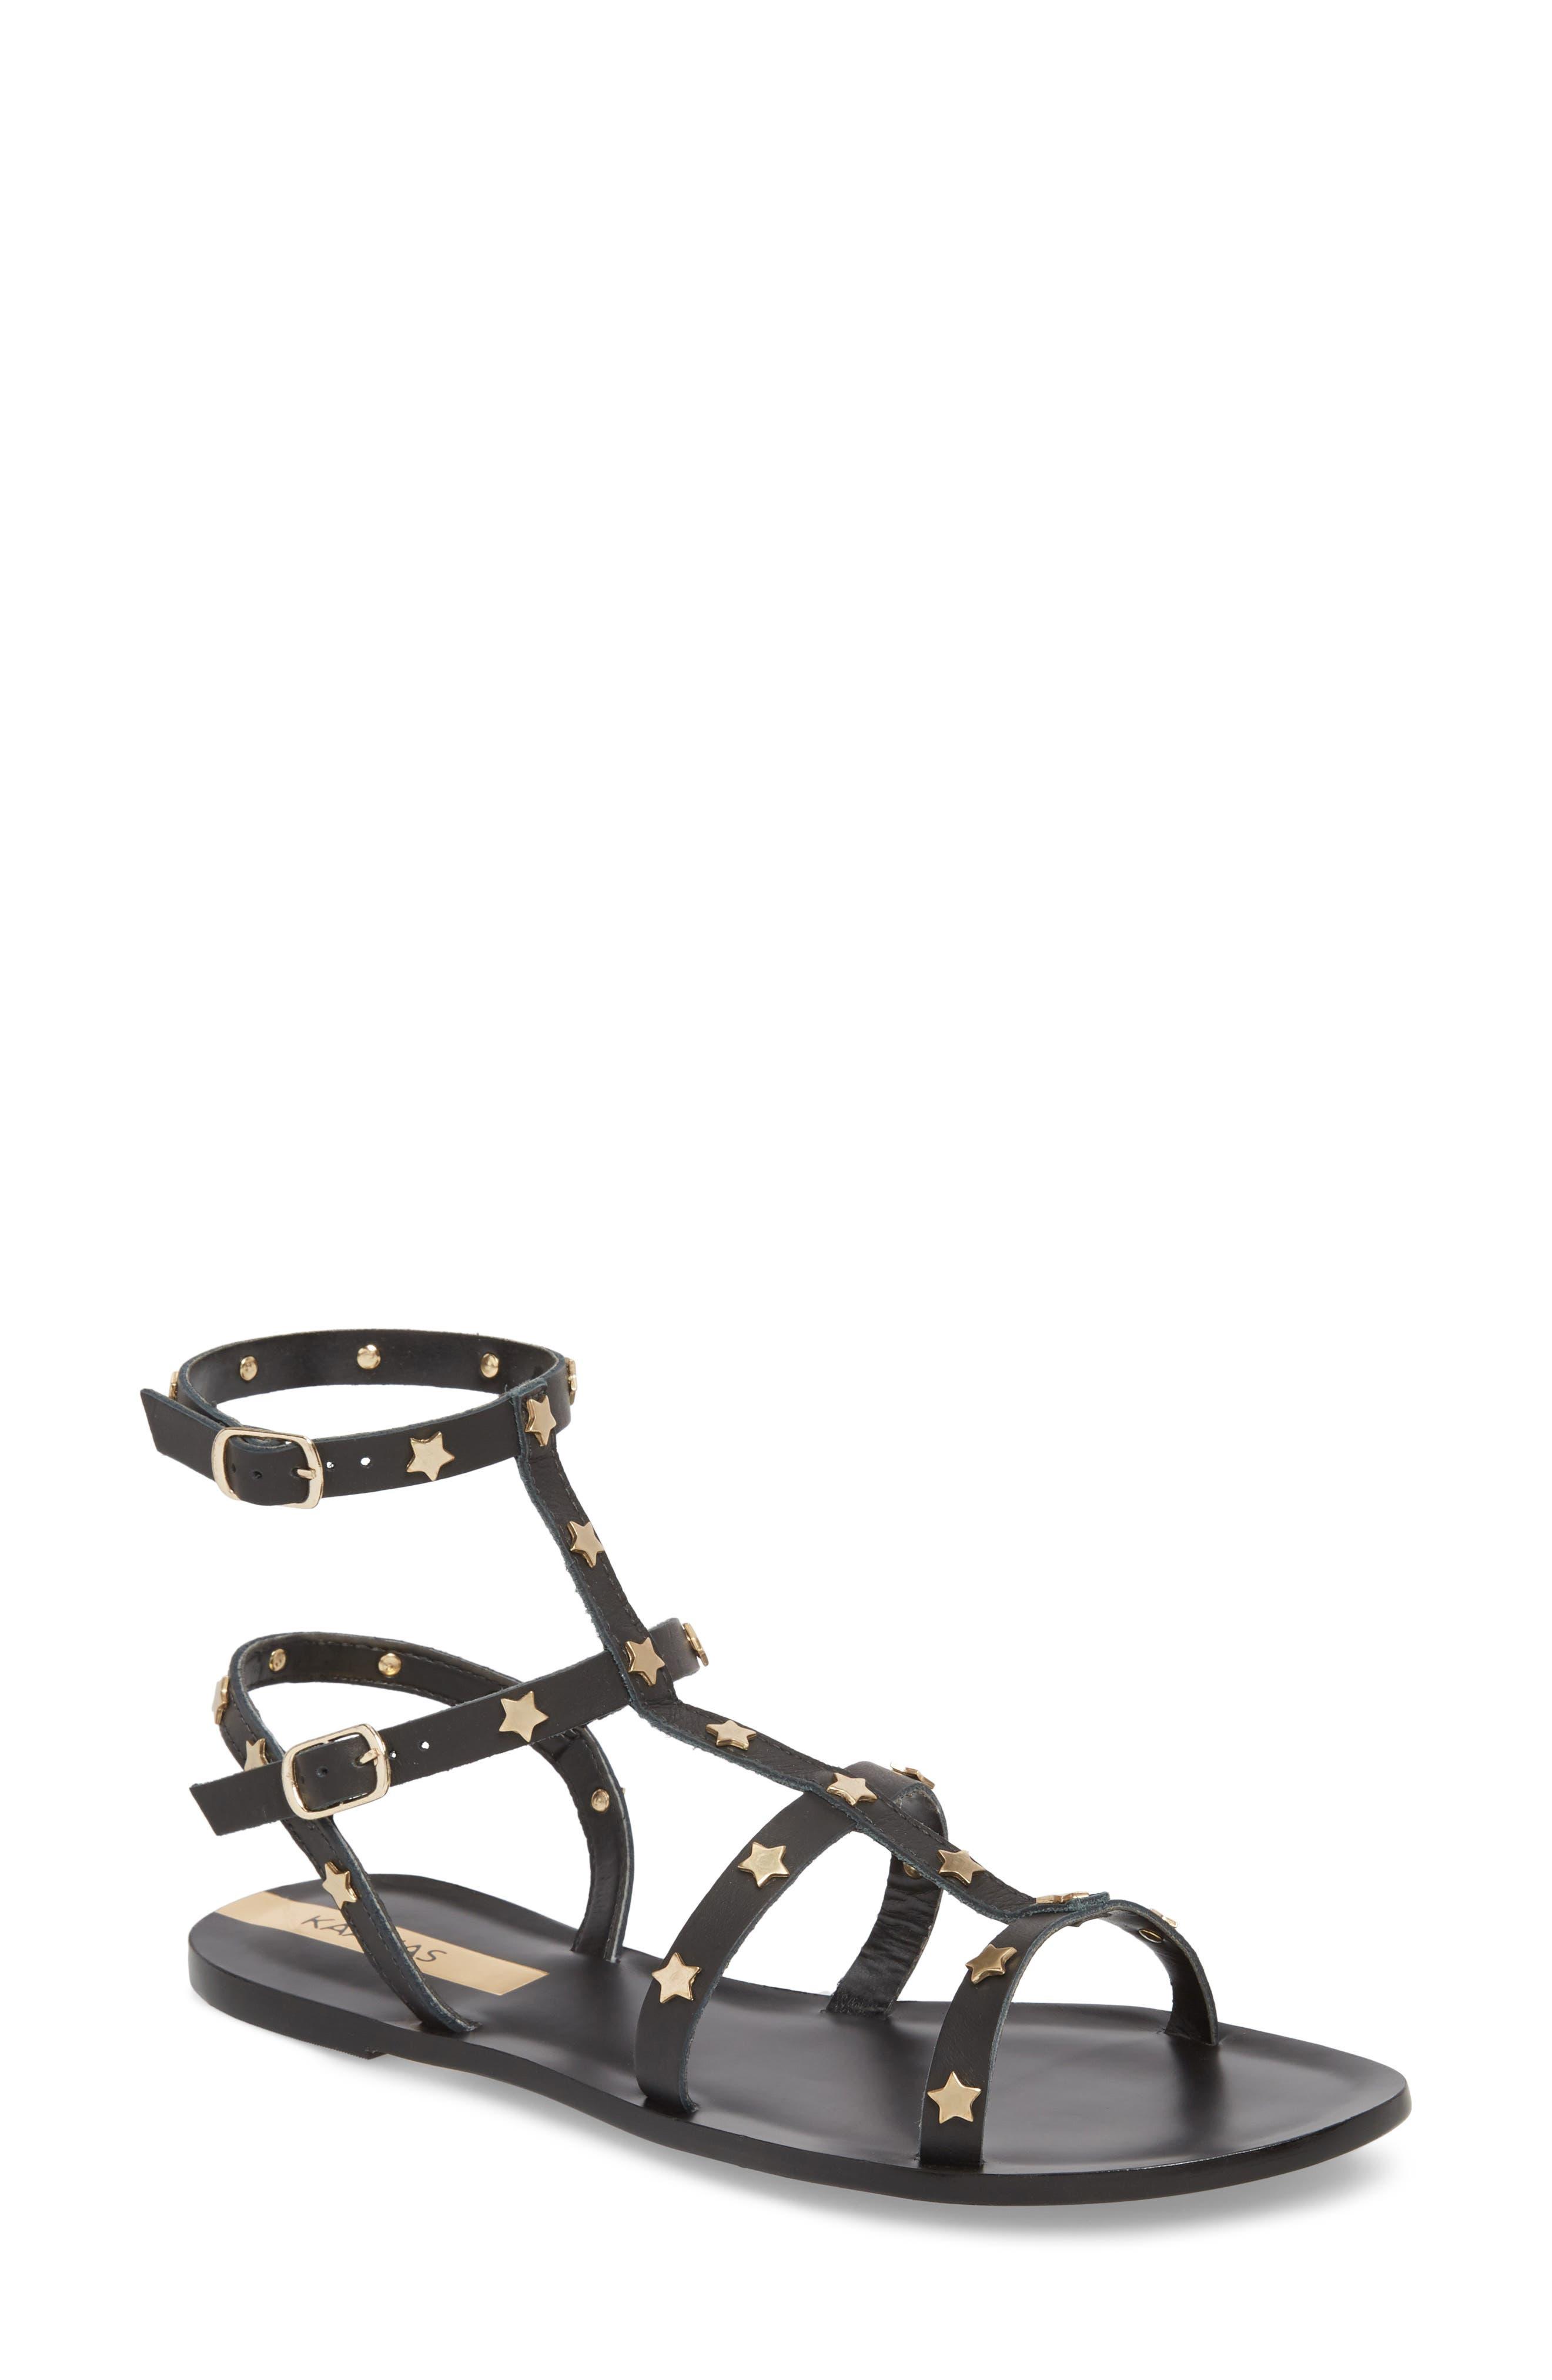 KAANAS Lapa Gladiator Sandal, Main, color, 001